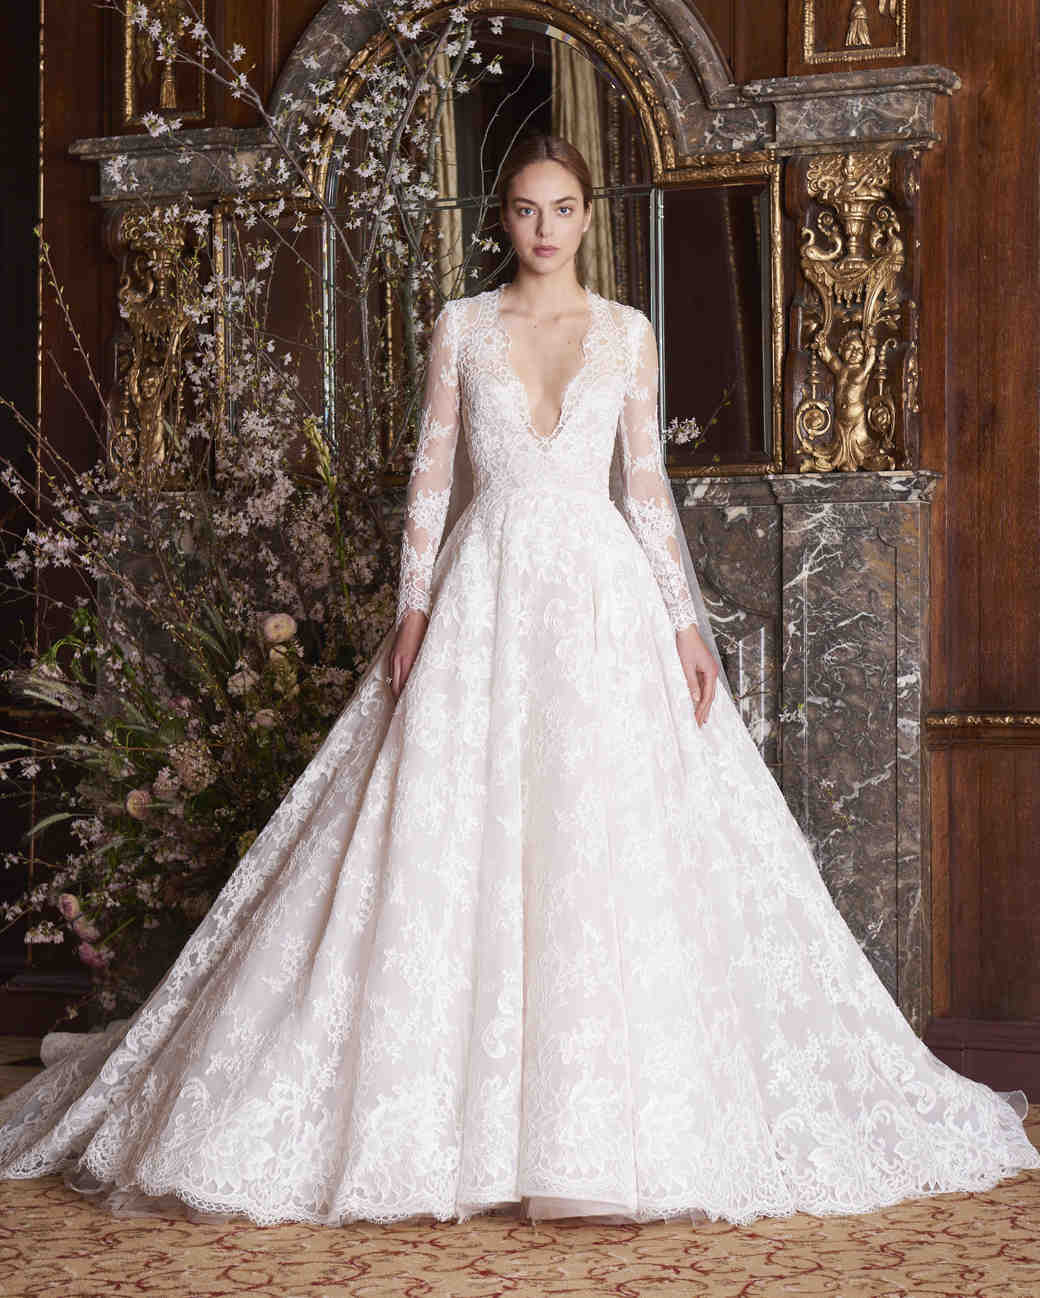 3788d21d9f0f Monique Lhuillier Wedding Dress Spring 2019 V-Neck Long Sleeve